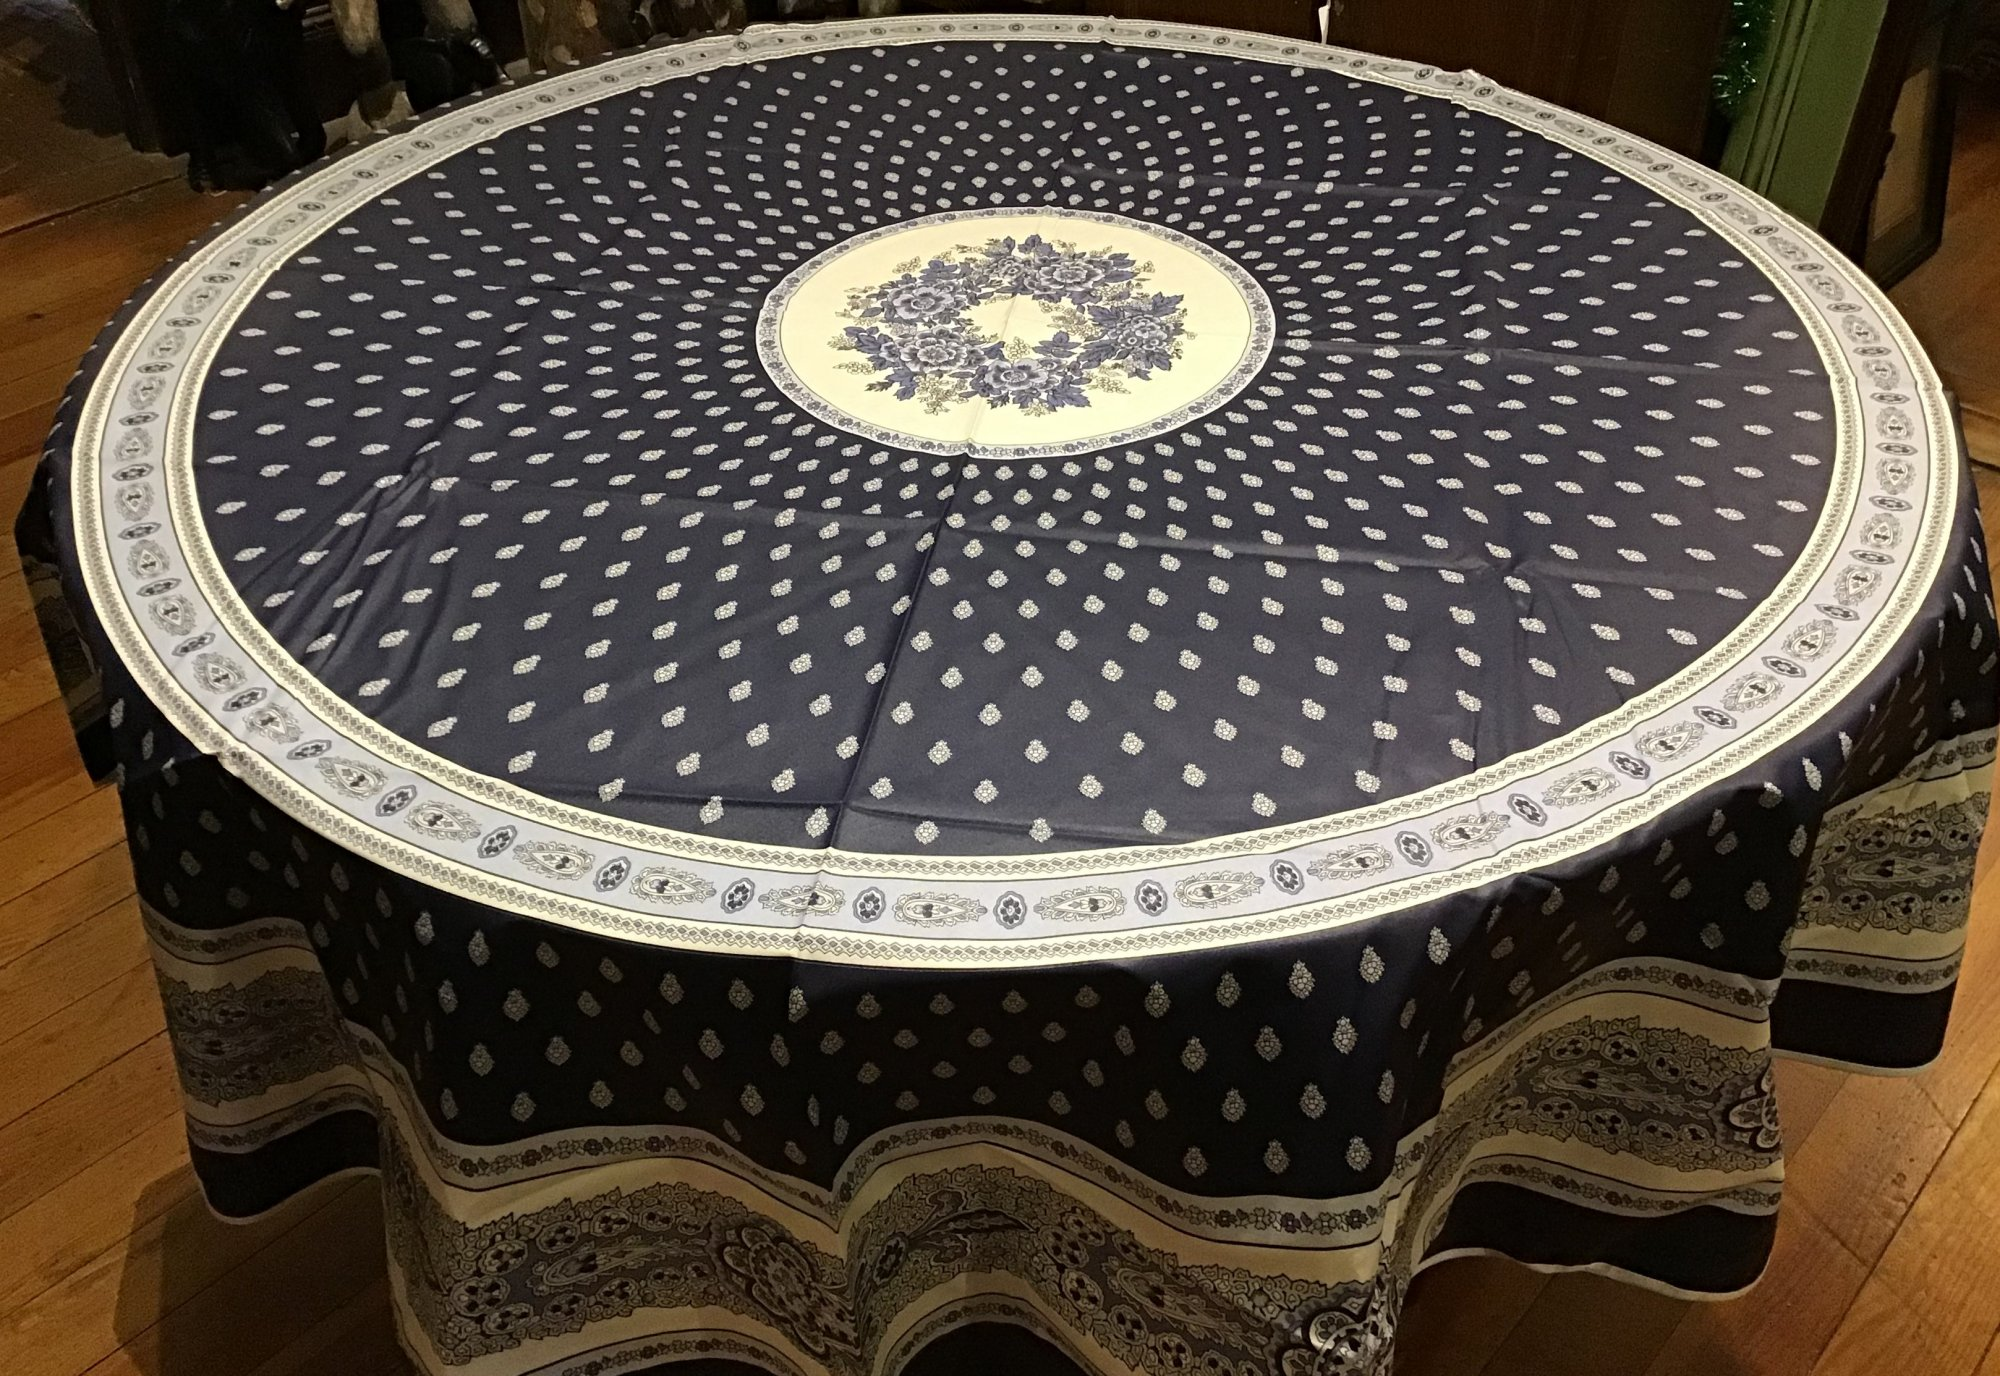 70 French Acrylic-Coated Round Tablecloth Bastide (Dark Blue)